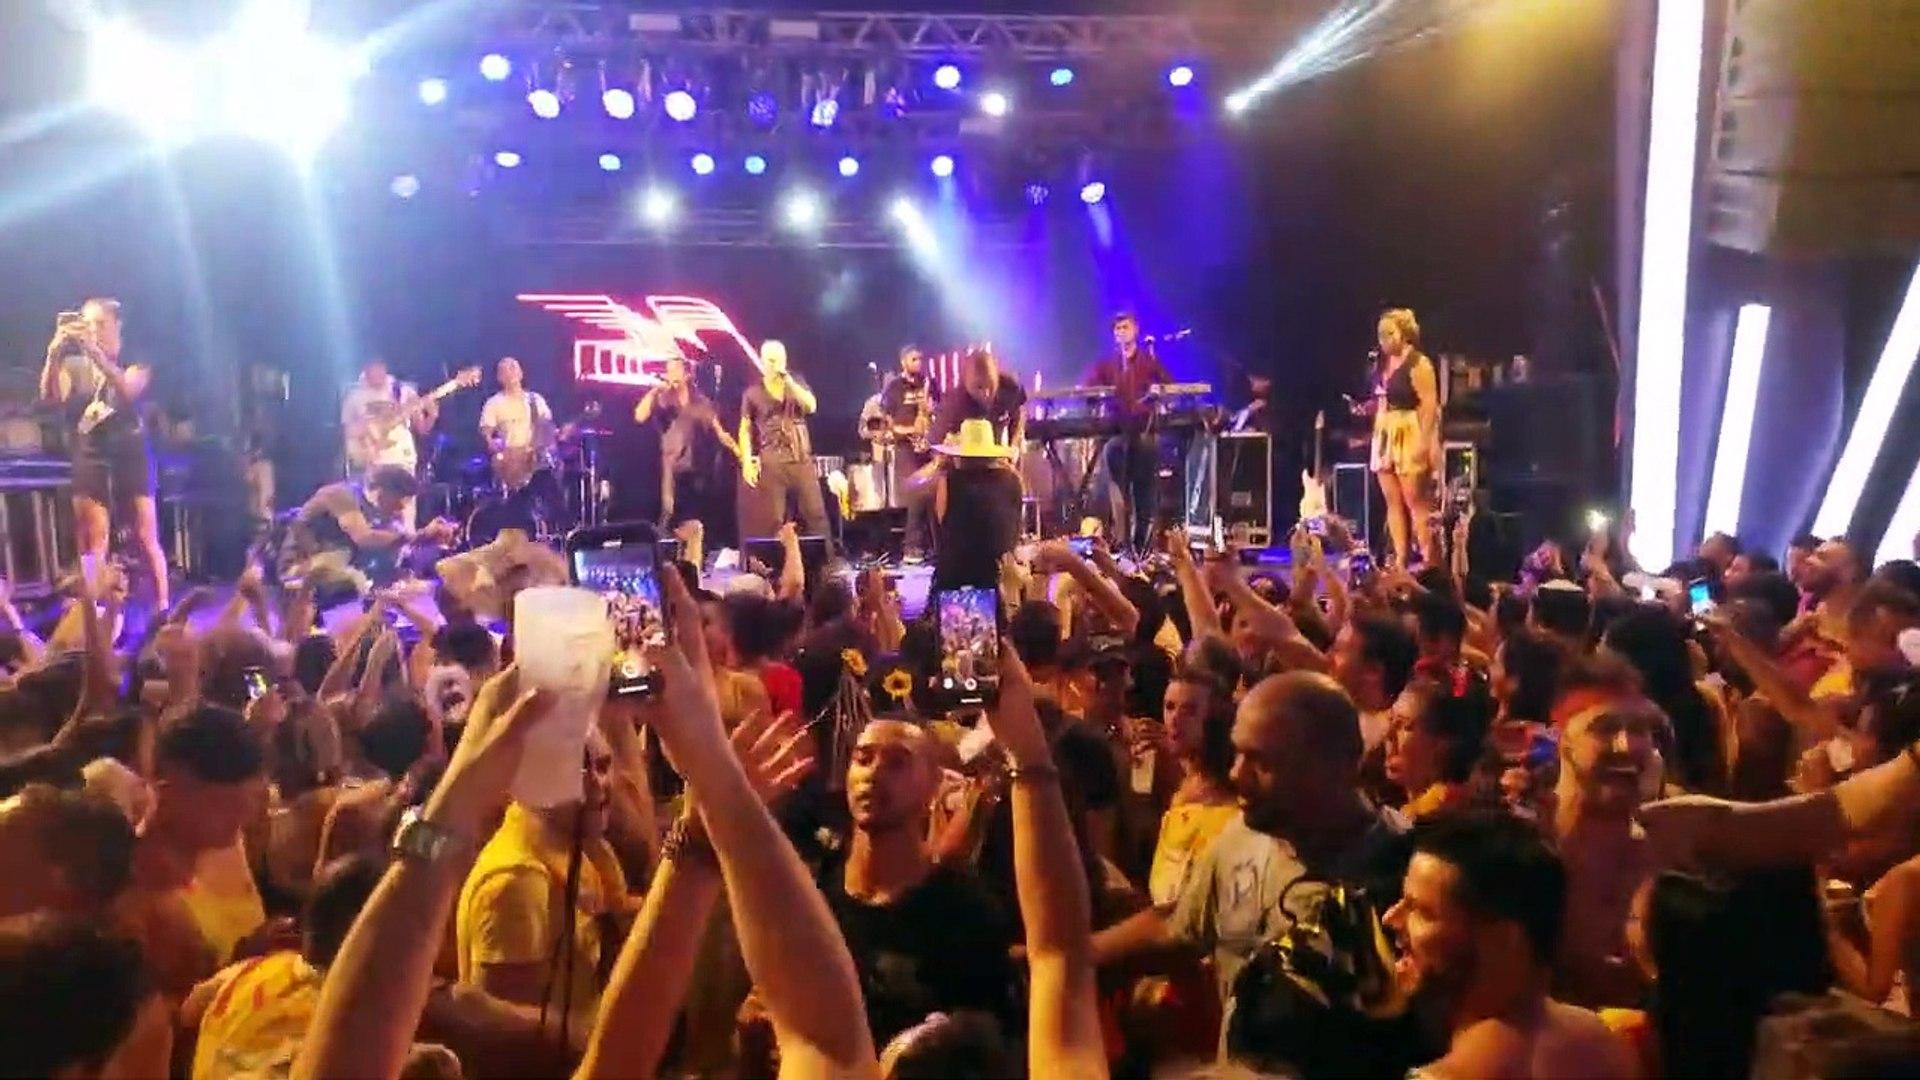 Banda EVA - Carnaval Salvador 2019 - Camarote do Nana